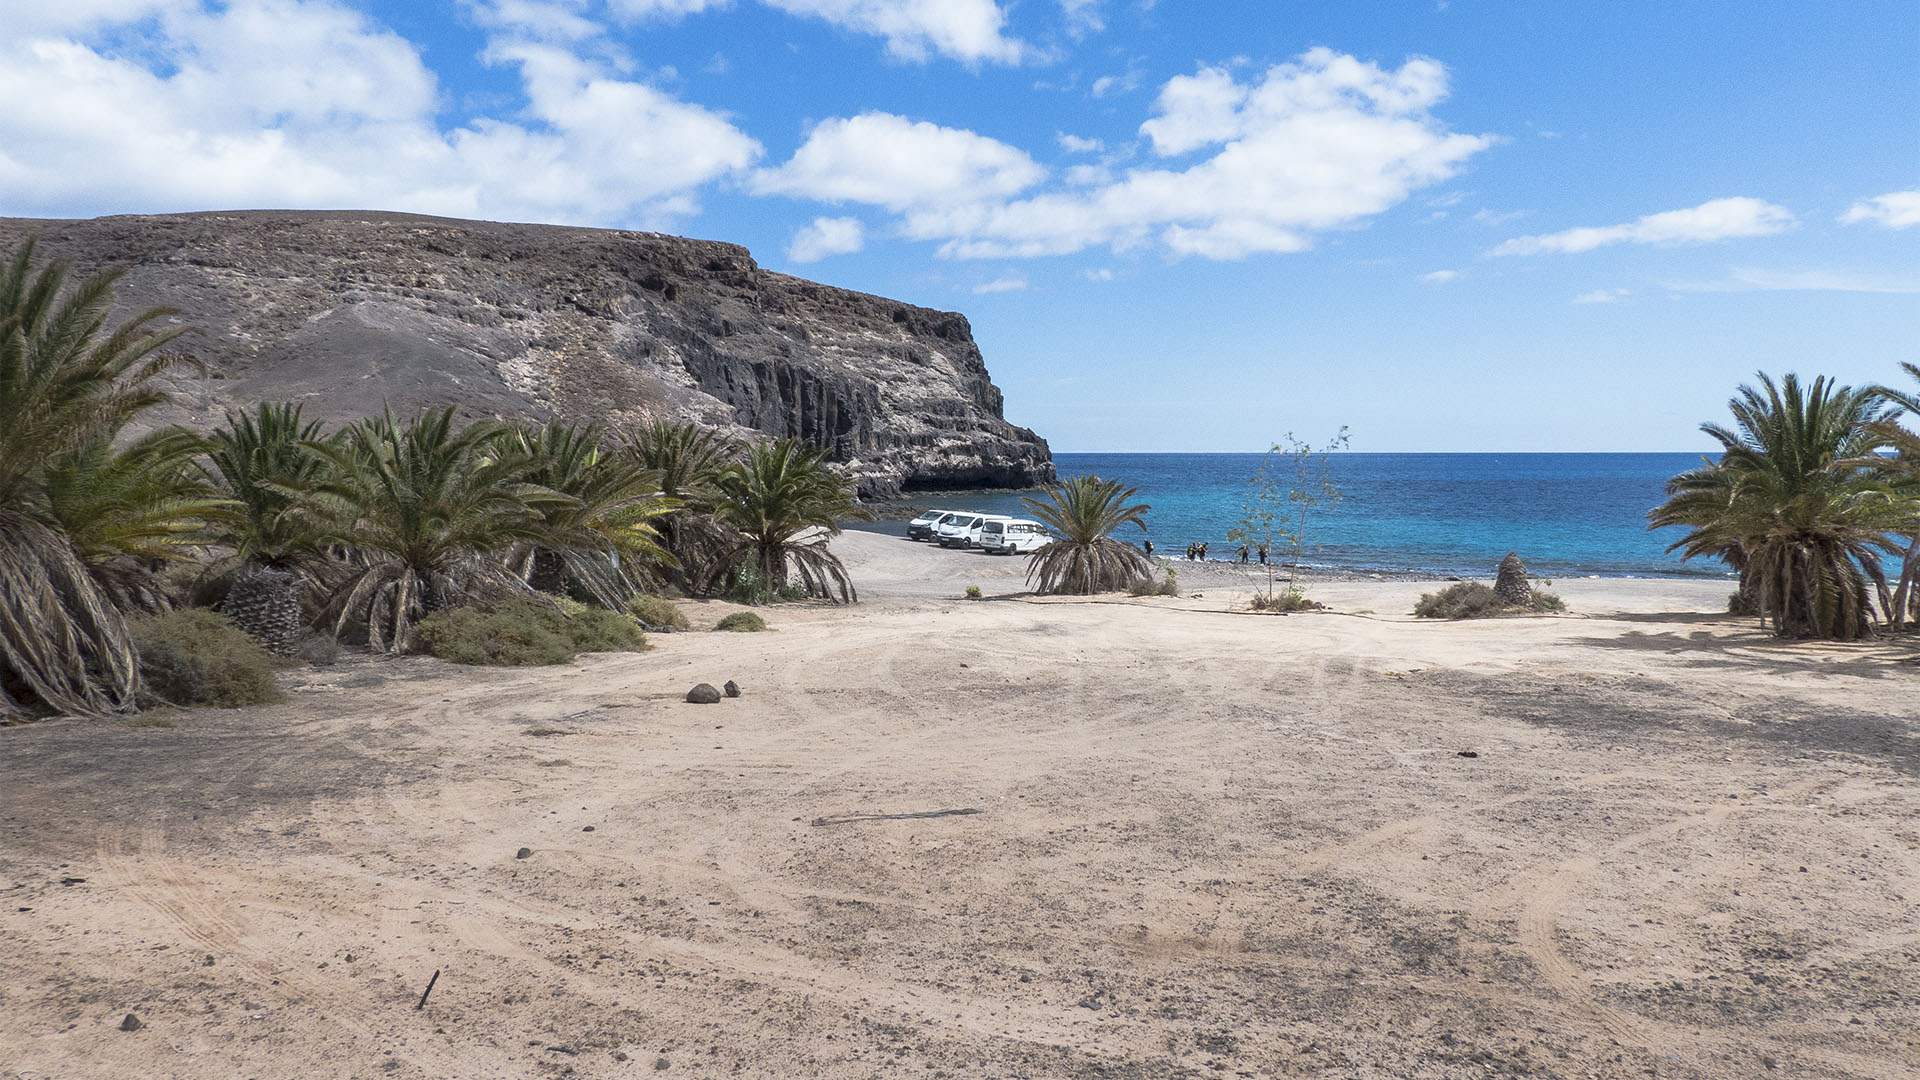 Die Strände Fuerteventuras: La Lajita, Puerto Rico.